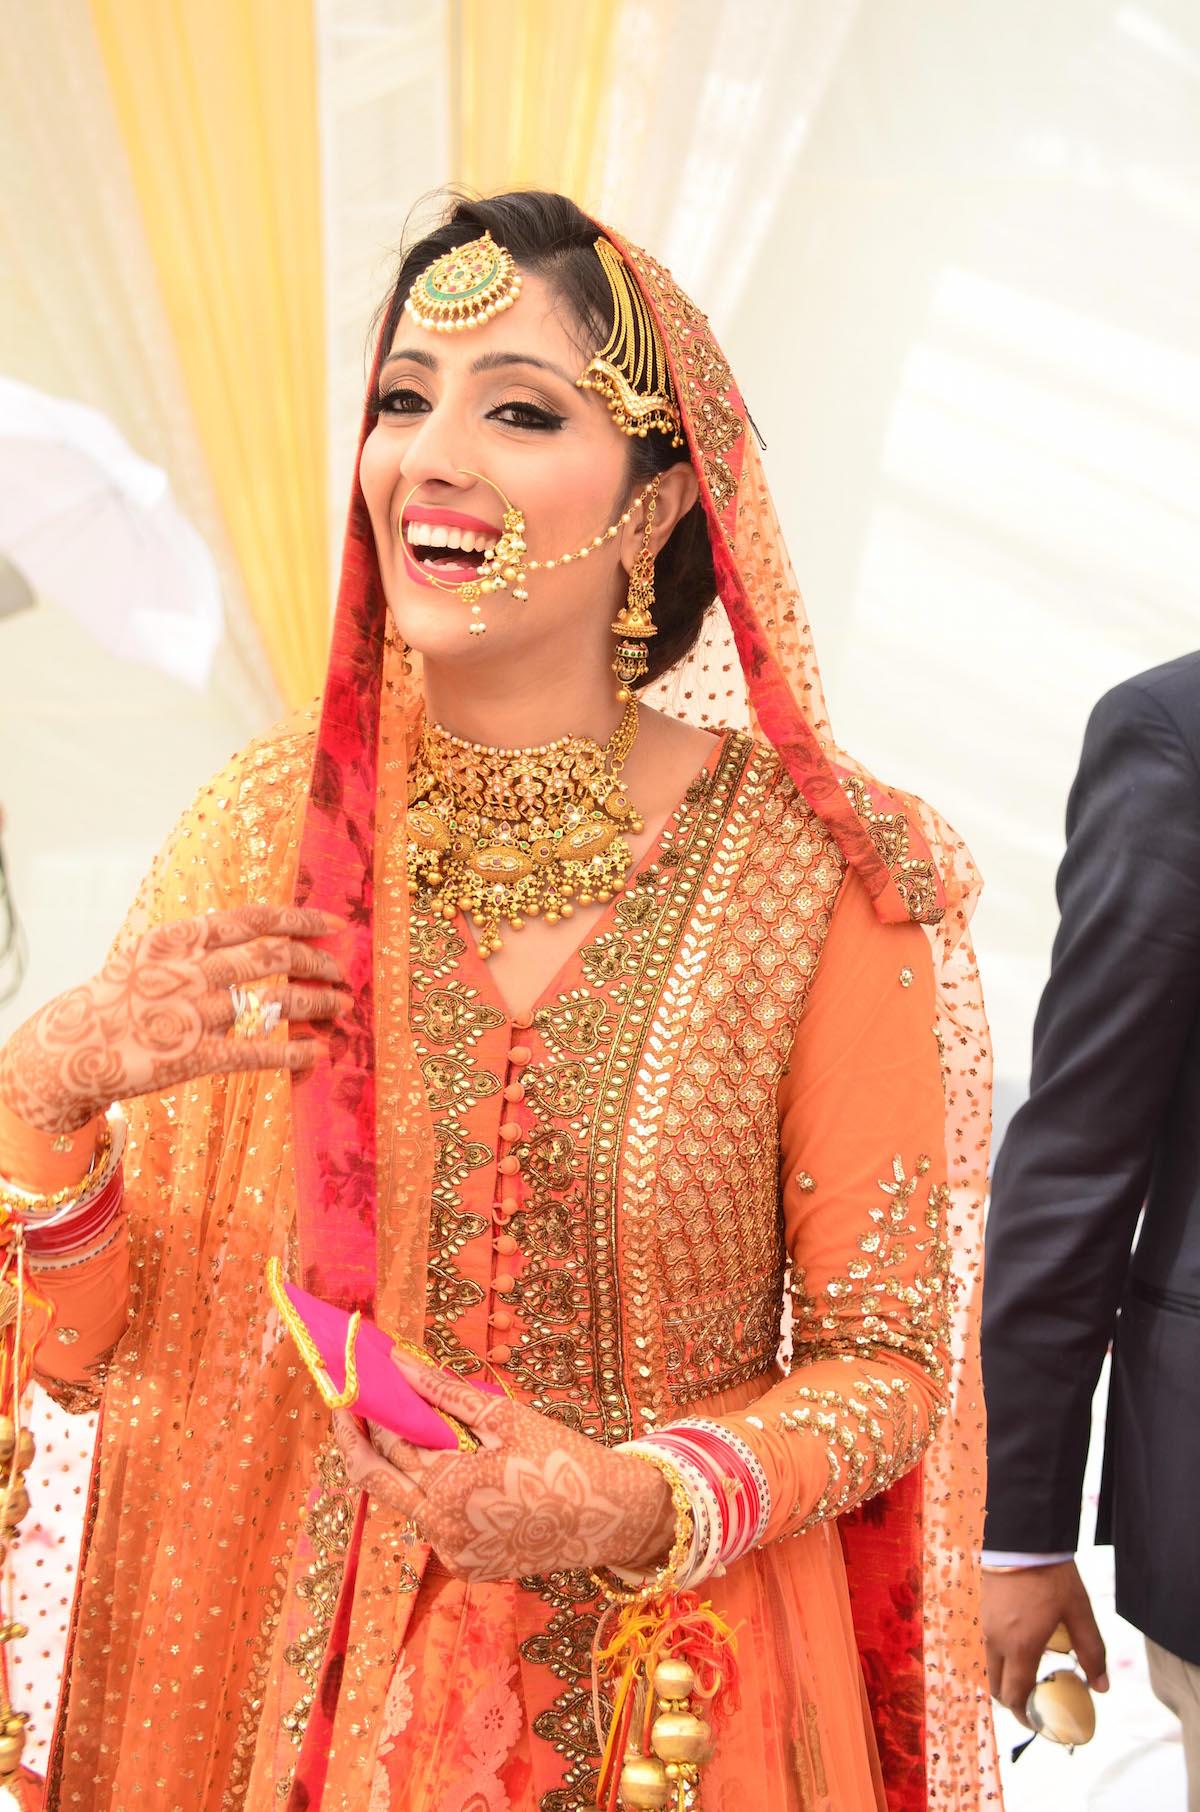 Wedding Wardrobe Shirin – Orange & Gold Sabyasachi jacket lehenga front  detailing – thedelhibride – An Indian Wedding Blog